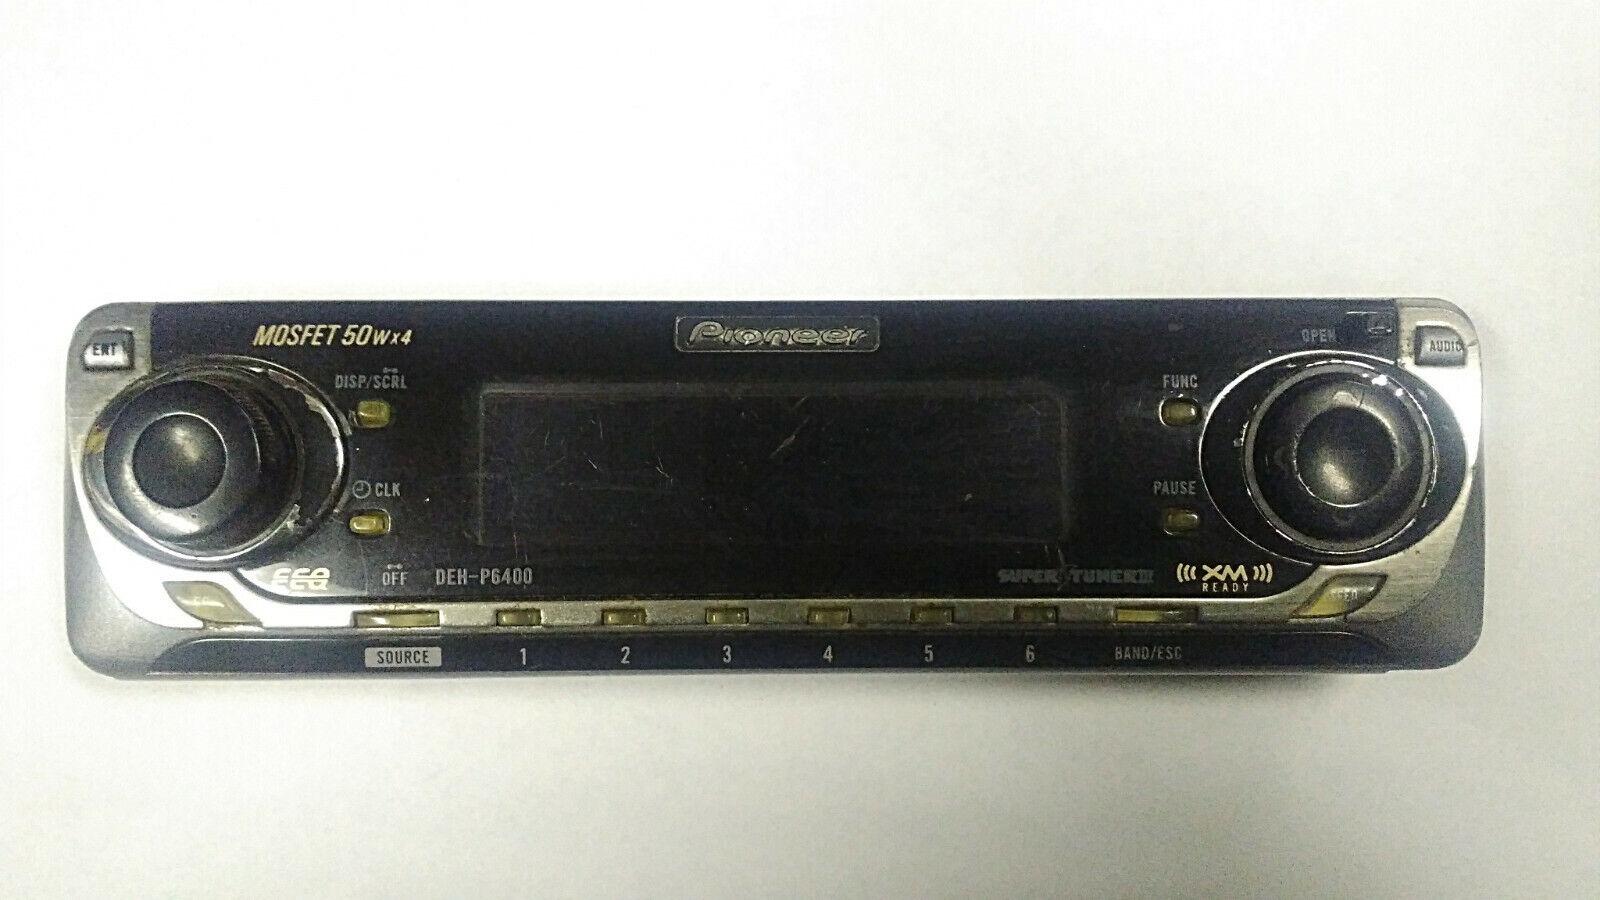 Купить Pioneer DEHP6400 AMFM CD Radio Headunit Detachable Flip Faceplate Replacement лот 163977197713